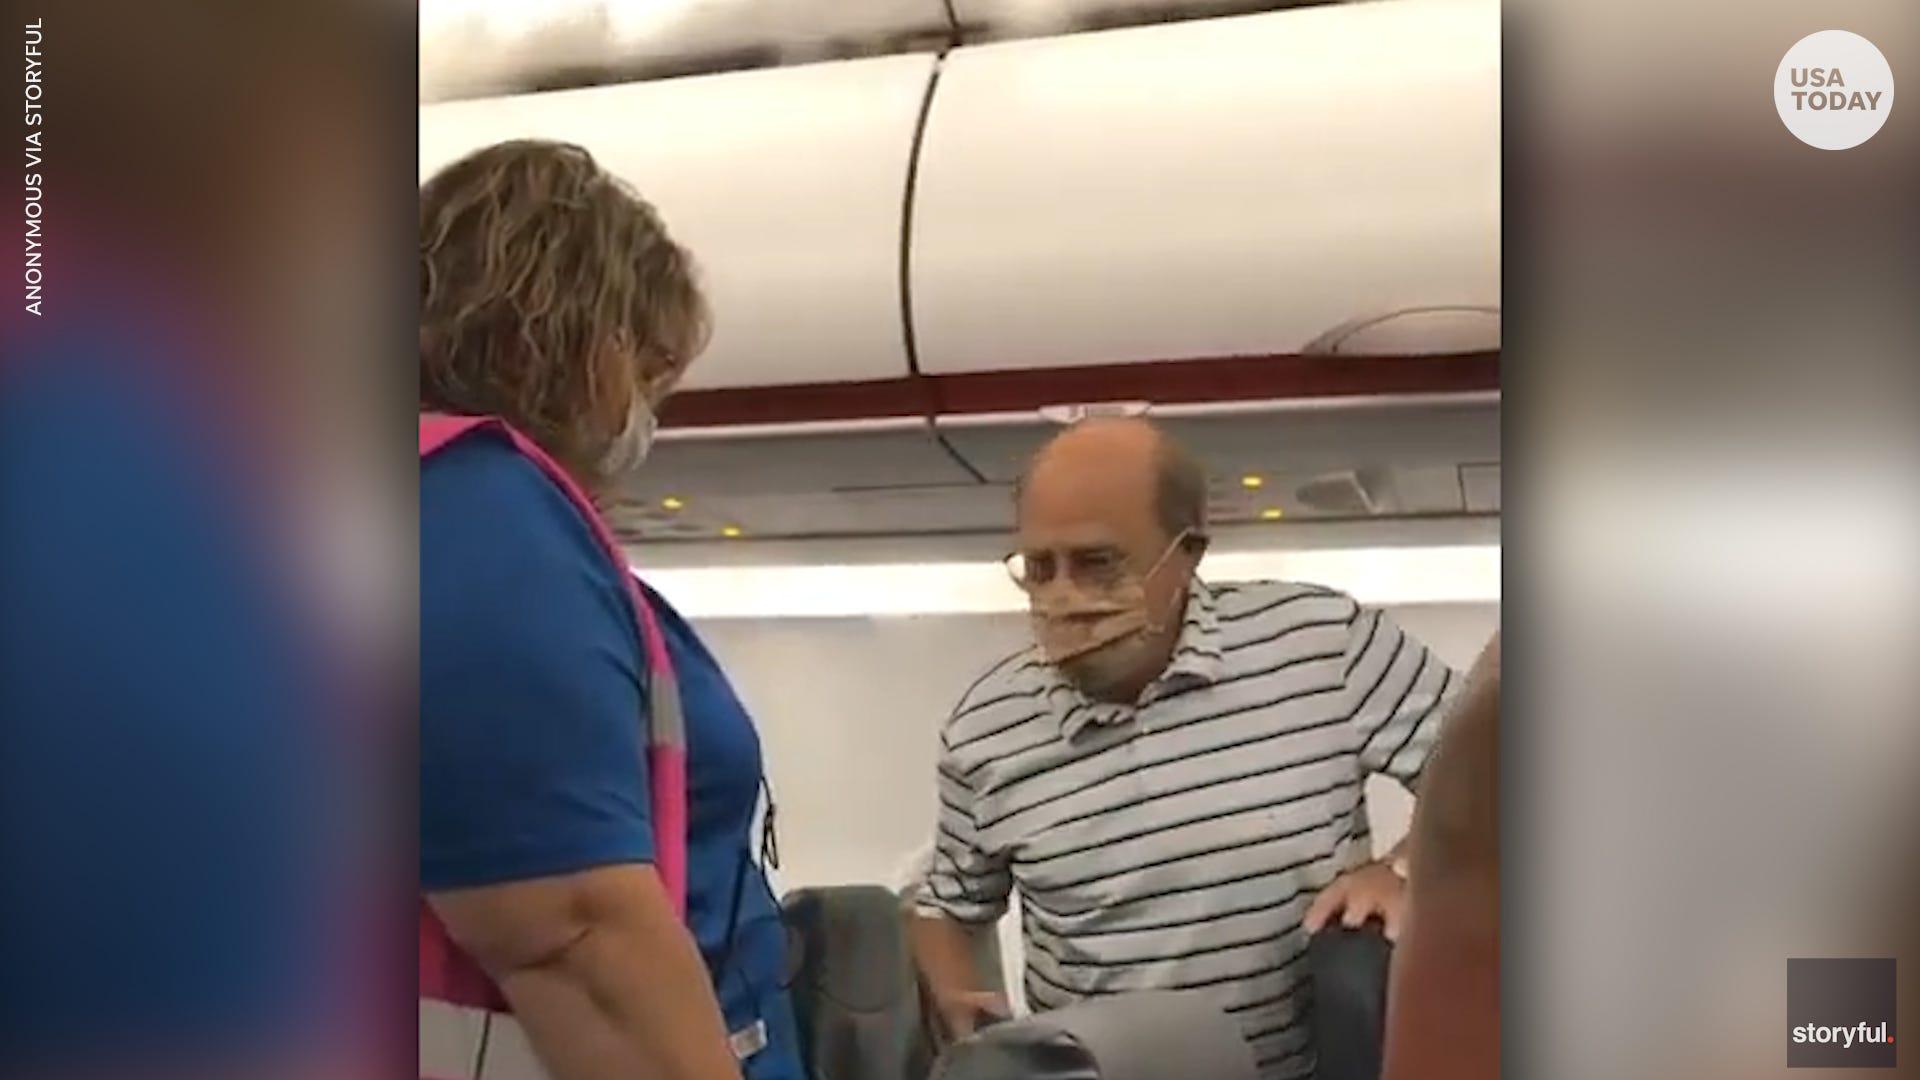 Allegiant passenger kicked off plane after asking flight attendant to put her mask back on